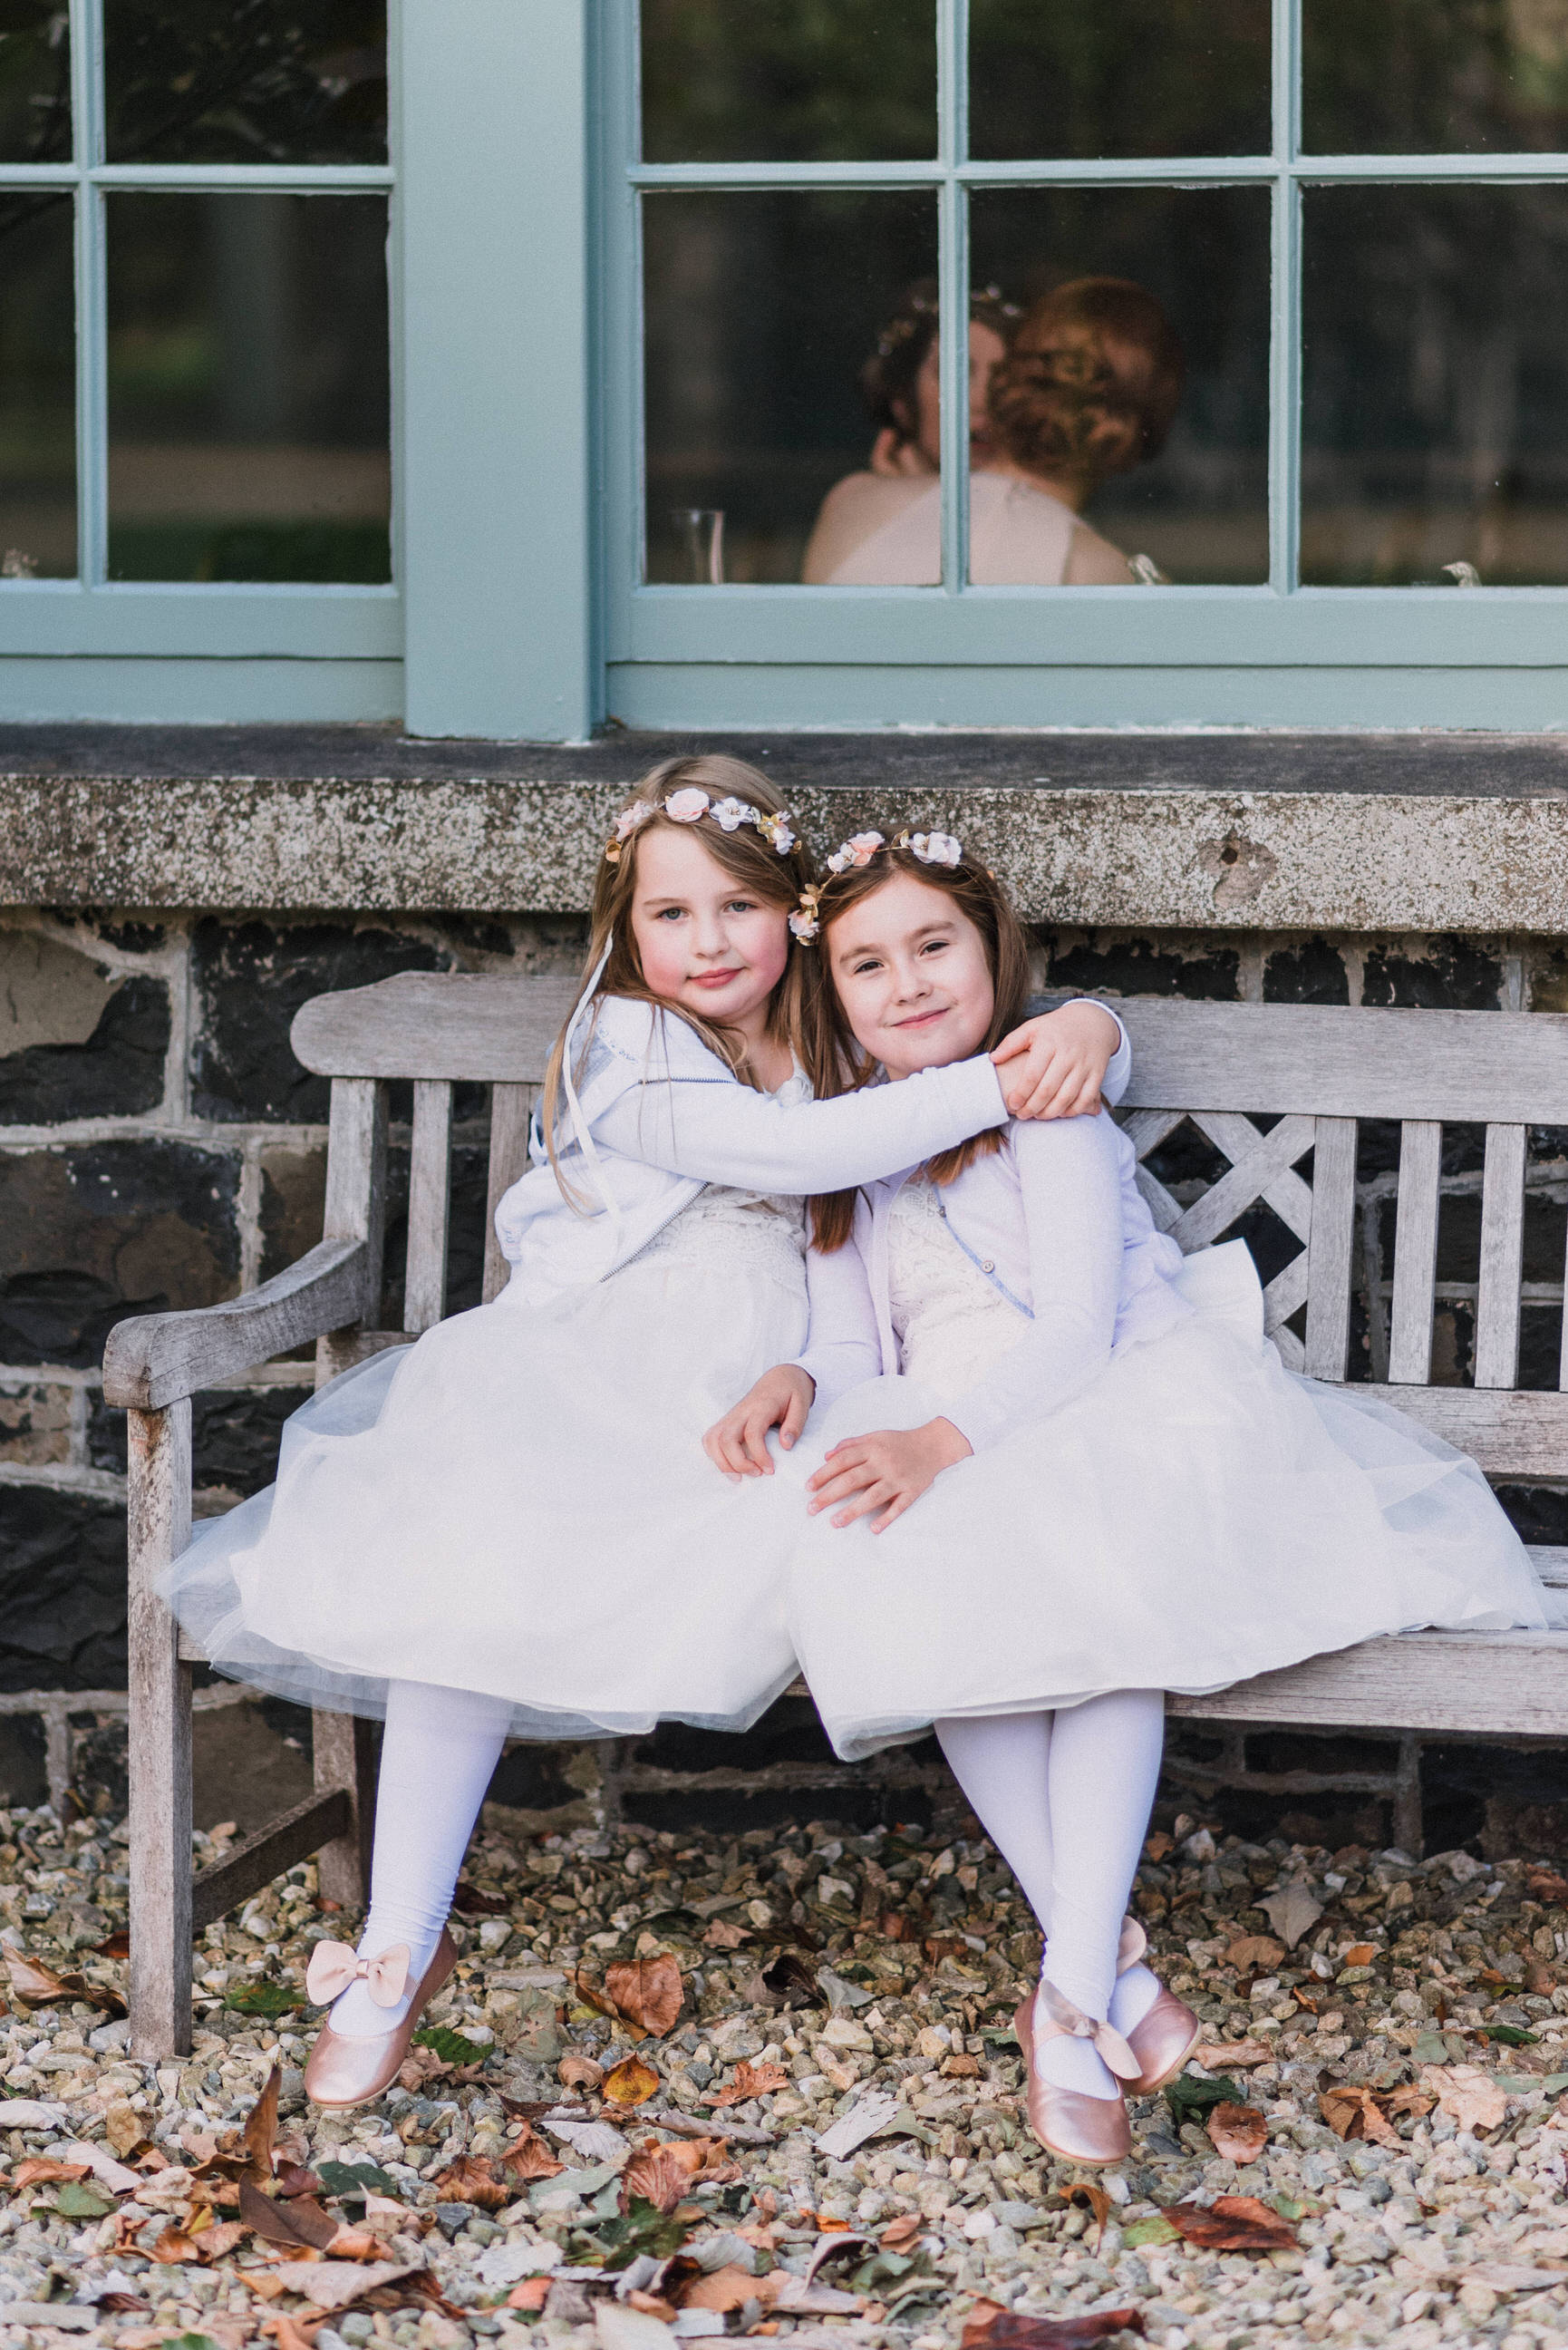 lissanoure castle wedding, northern ireland wedding photographer, romantic northern irish wedding venue, castle wedding ireland, natural wedding photography ni (97).jpg